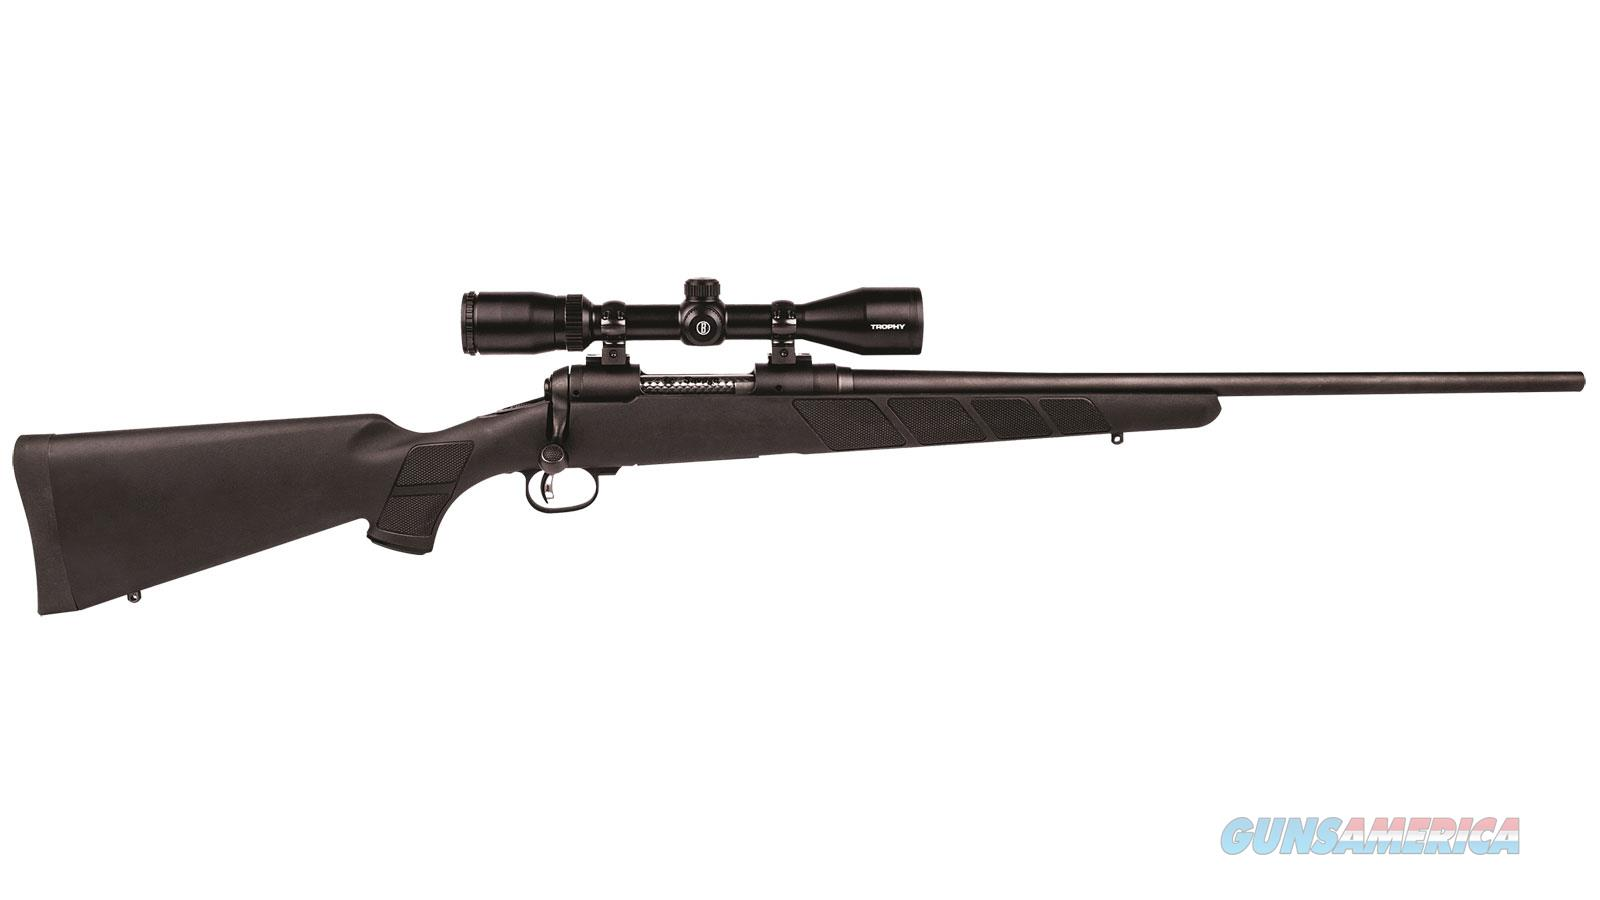 Savage 111 Doa Hunter Xp 300 Win Mag 24'' Barrel Accutrigger 22613  Guns > Rifles > S Misc Rifles